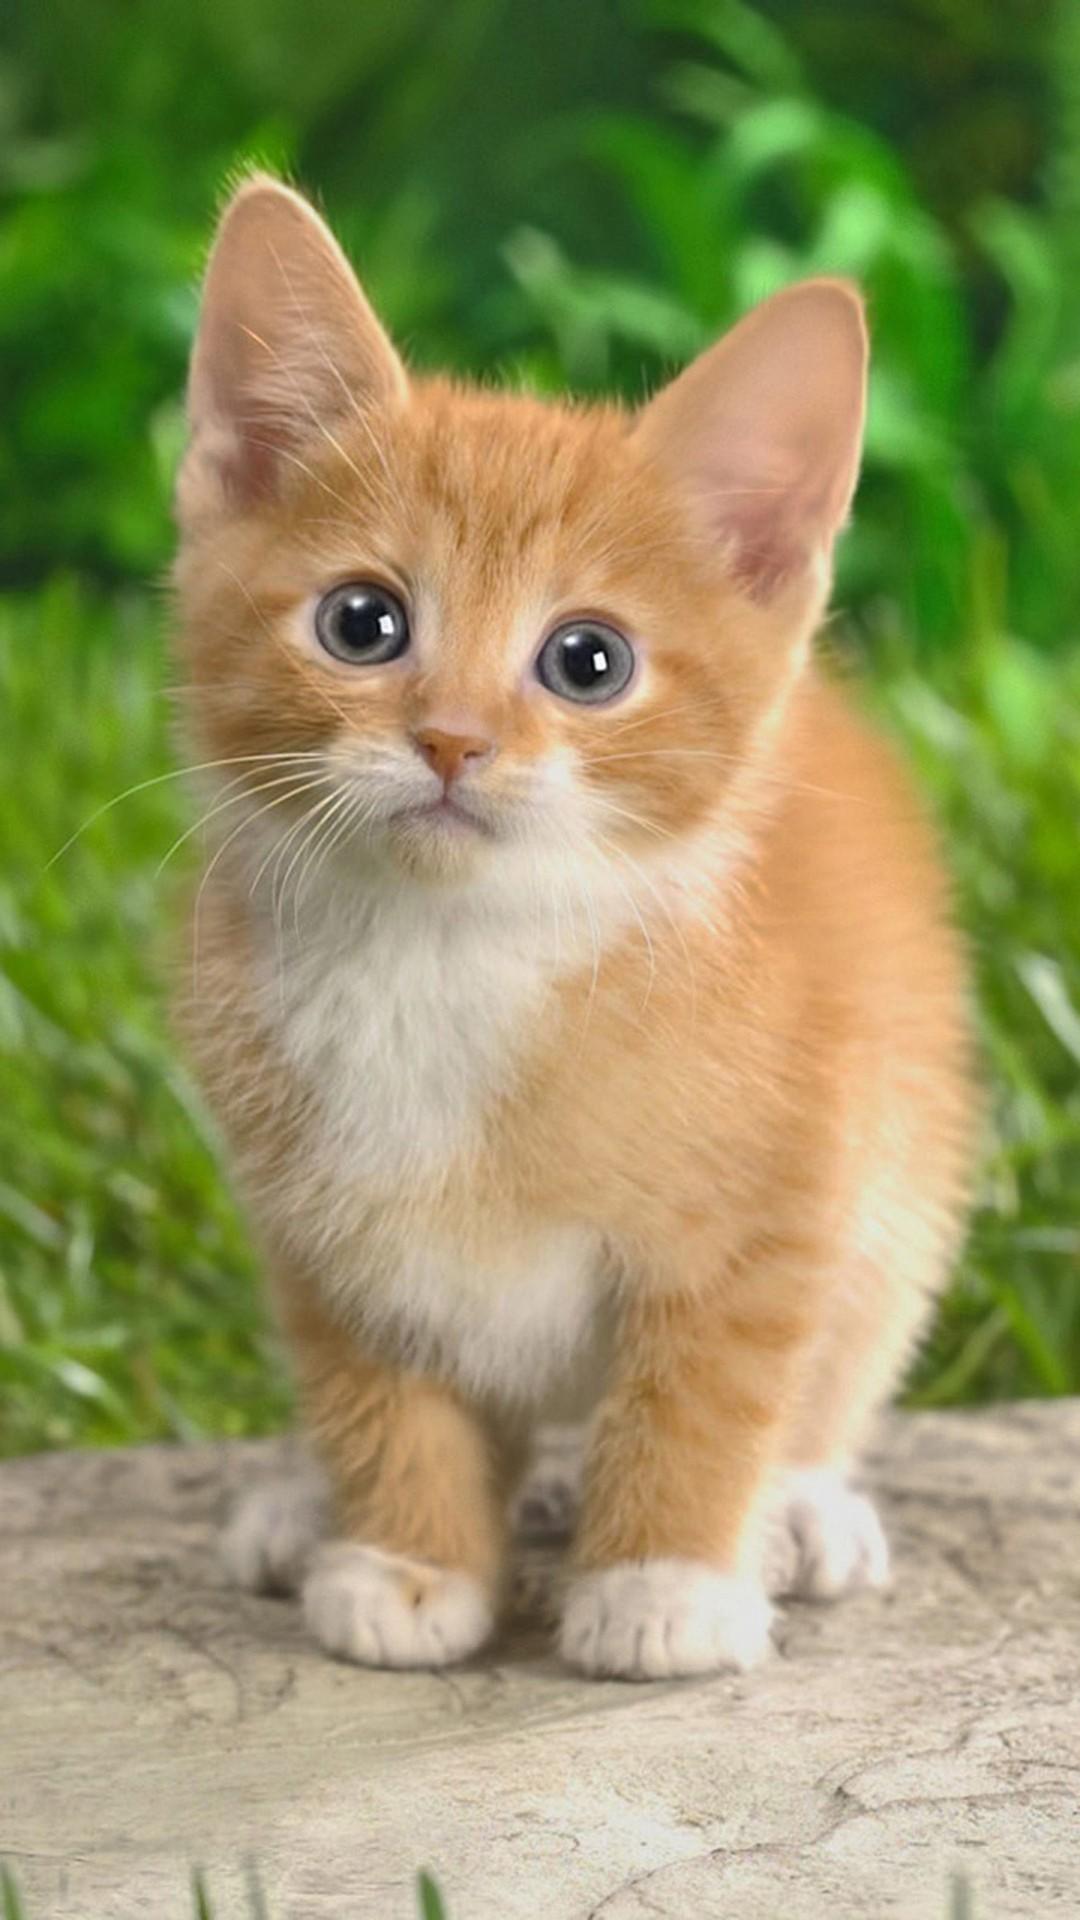 xpx Funny Kittens Wallpaper